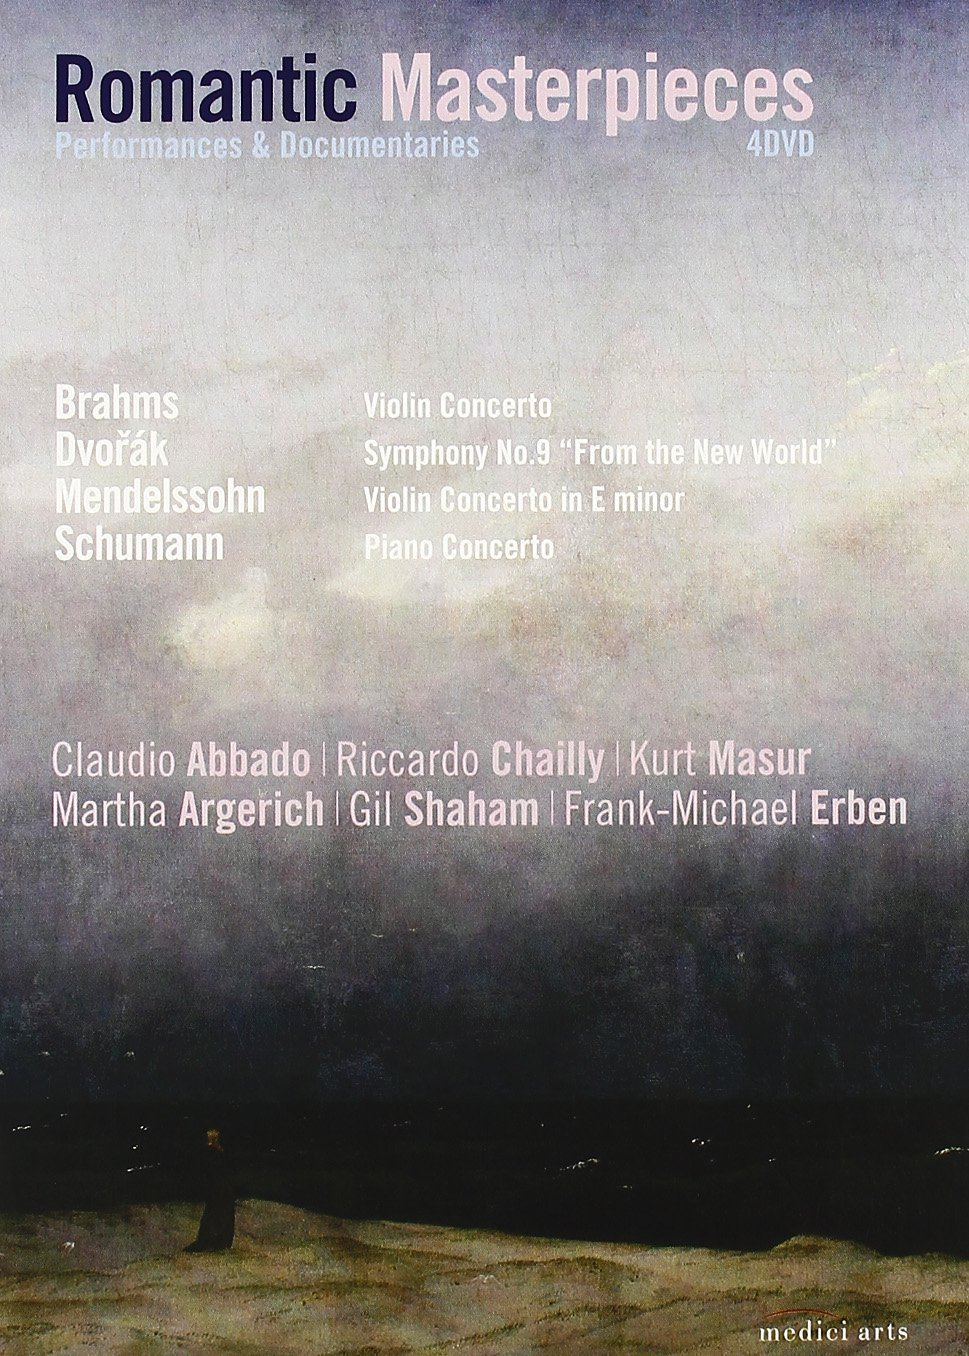 Romantic Masterpieces: Performances and Documentaries (Brahms, Mendelssohn, Dvorak, Schumann)